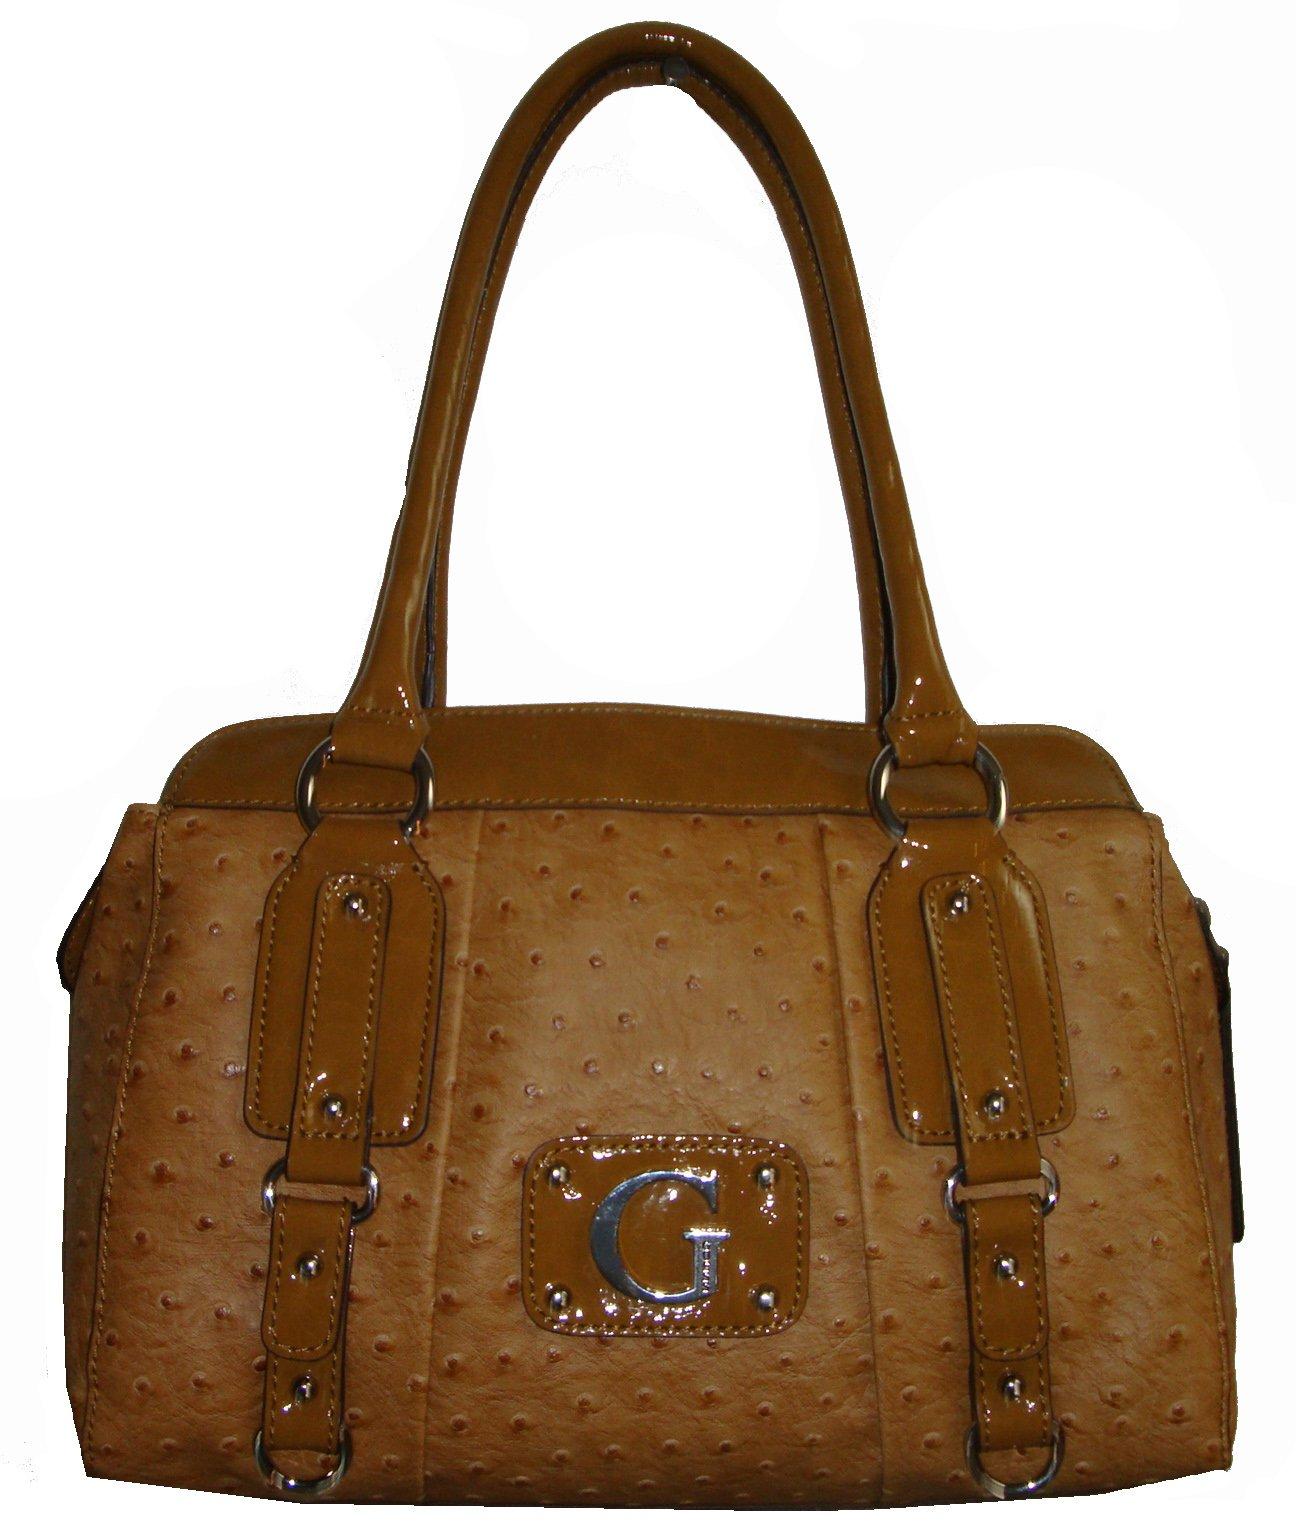 Guess Women's Rogue Satchel Style Handbag, Cognac by GUESS